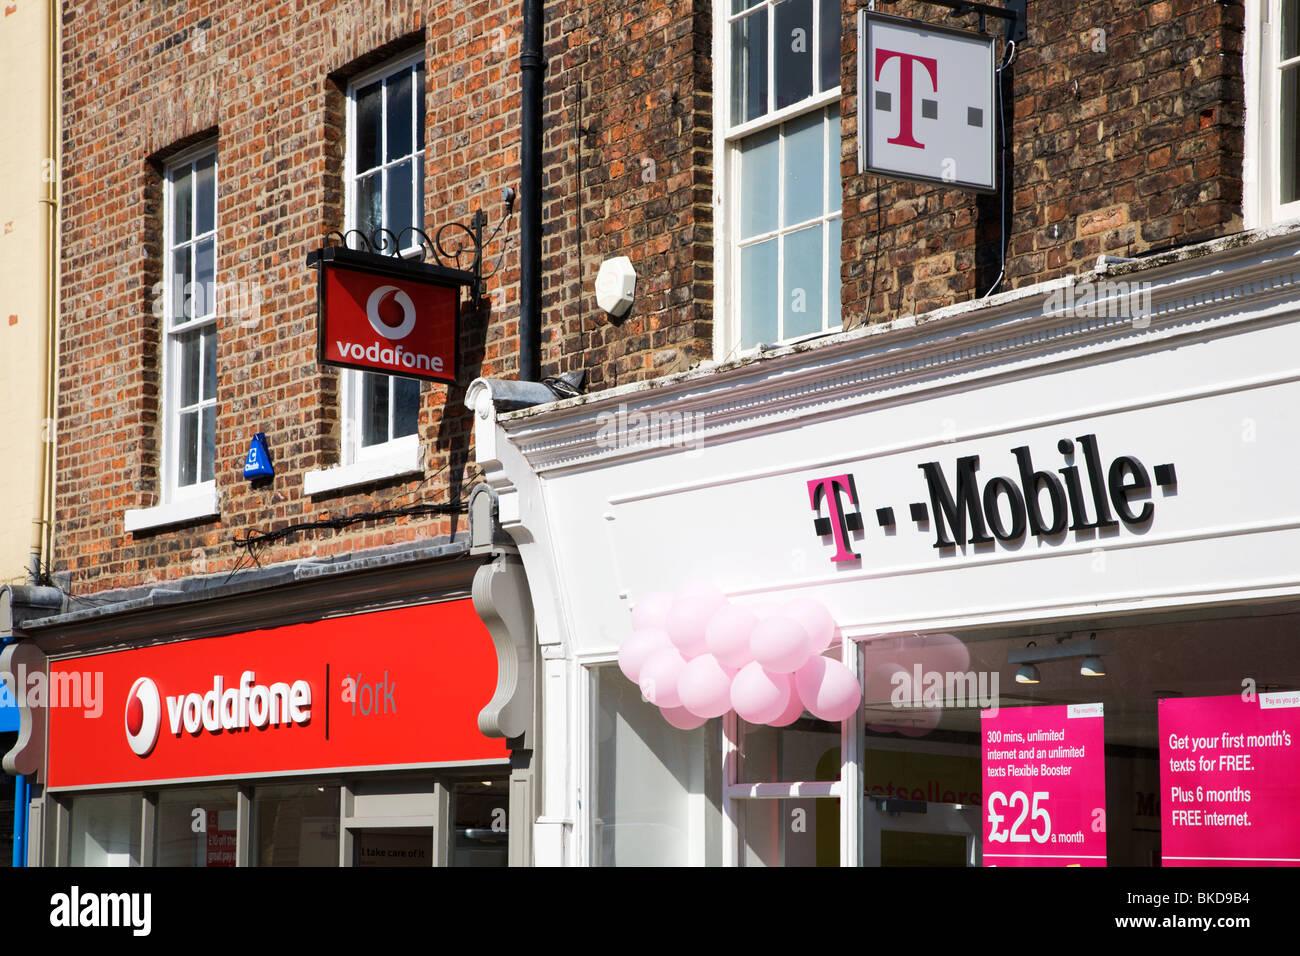 Mobile Phone Shops Stock Photos & Mobile Phone Shops Stock